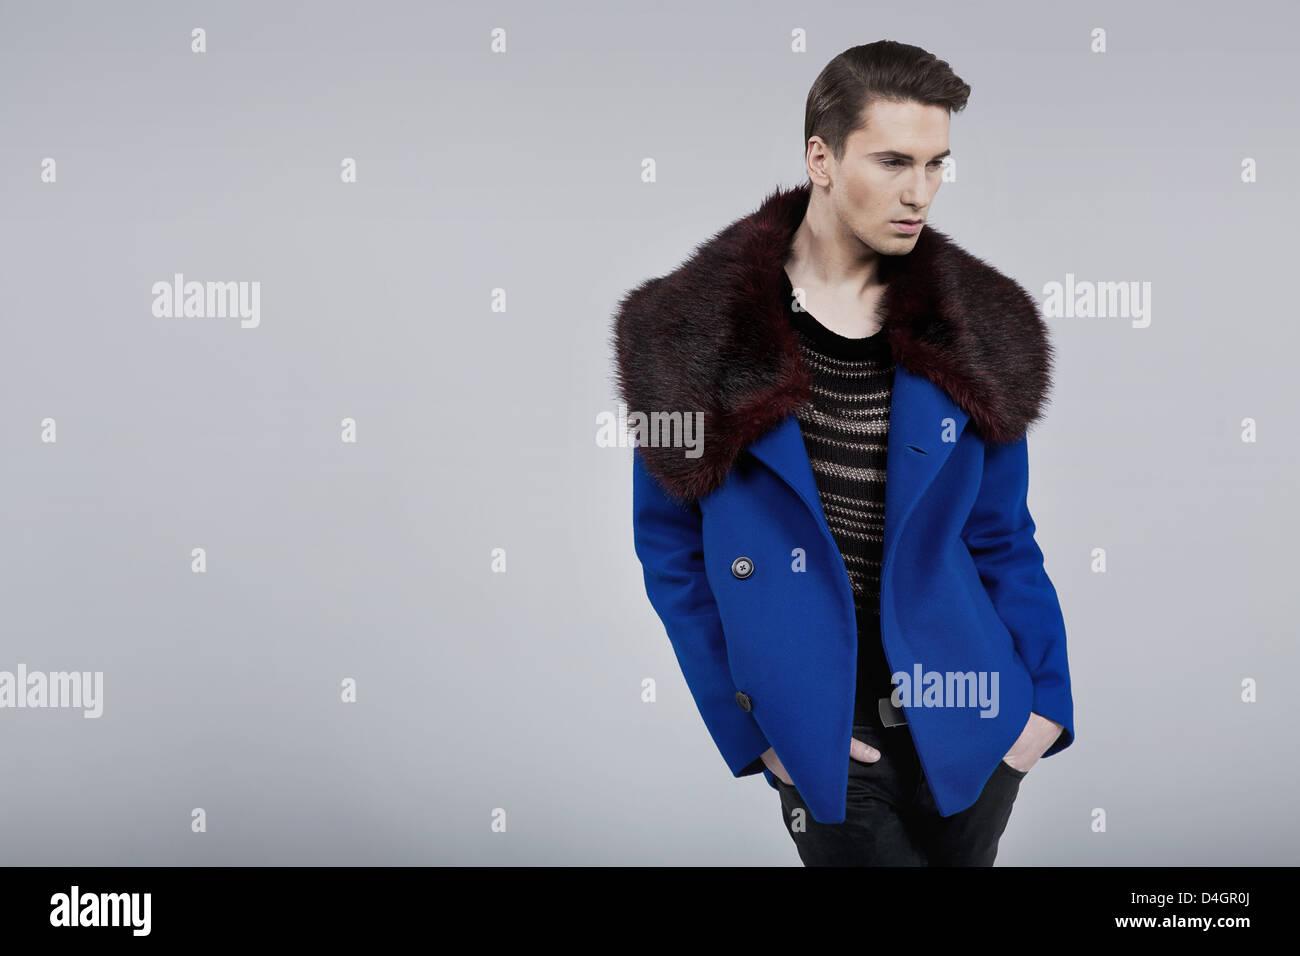 Guapo vestido de abrigo de moda de primavera Imagen De Stock